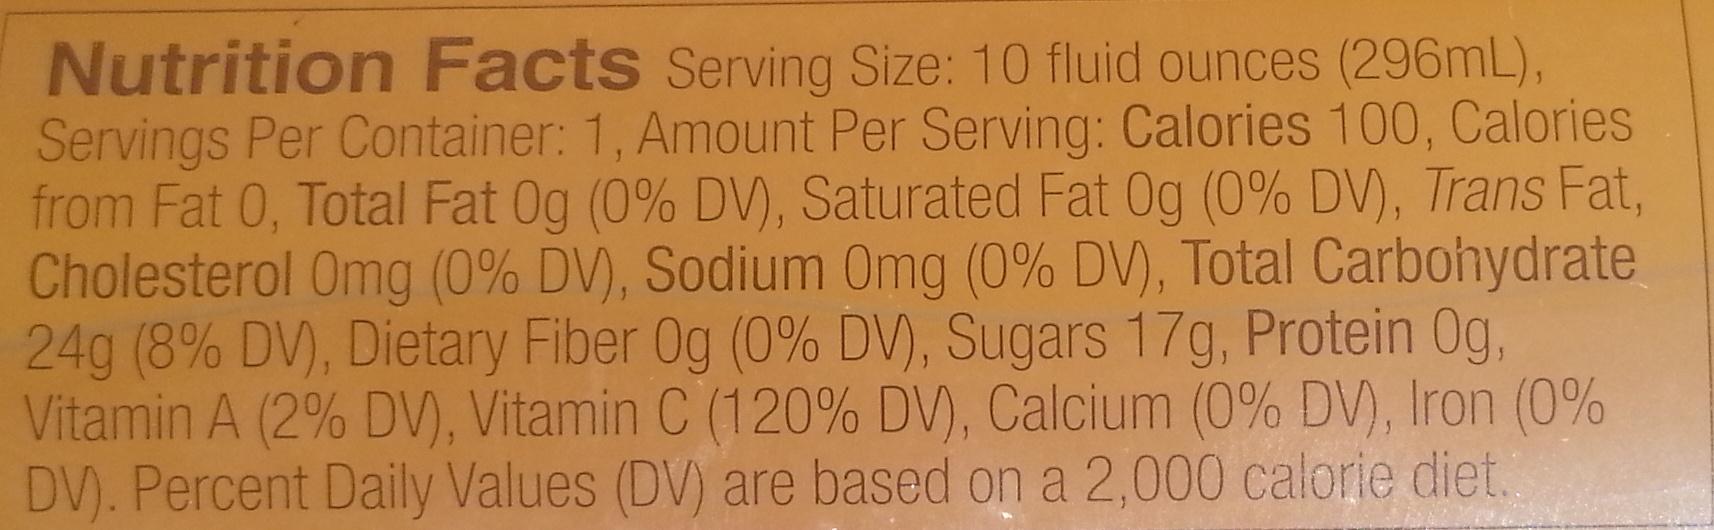 Organic Wild poppy Peach vanilla - Nutrition facts